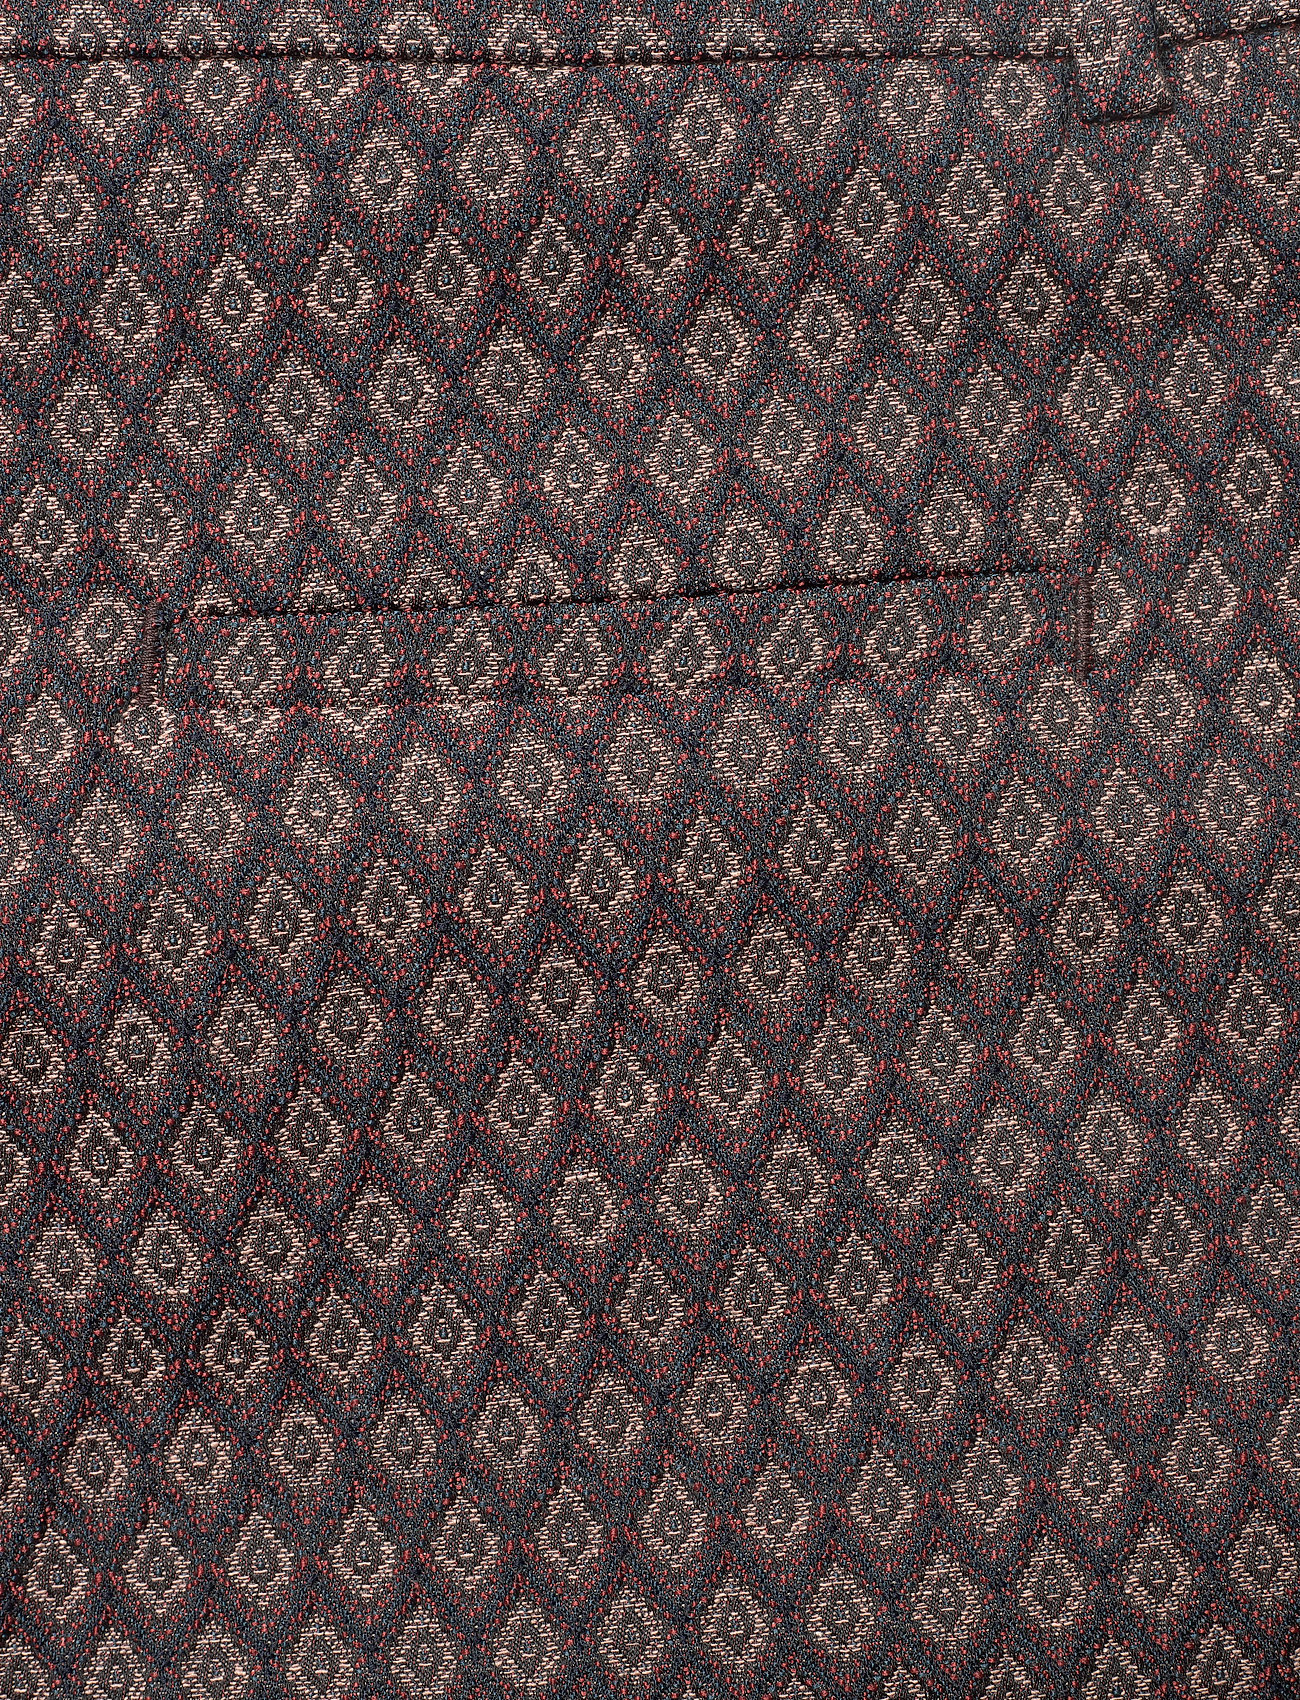 Fiveunits Angelie 700 Zip - Byxor Asphalt Tapestry